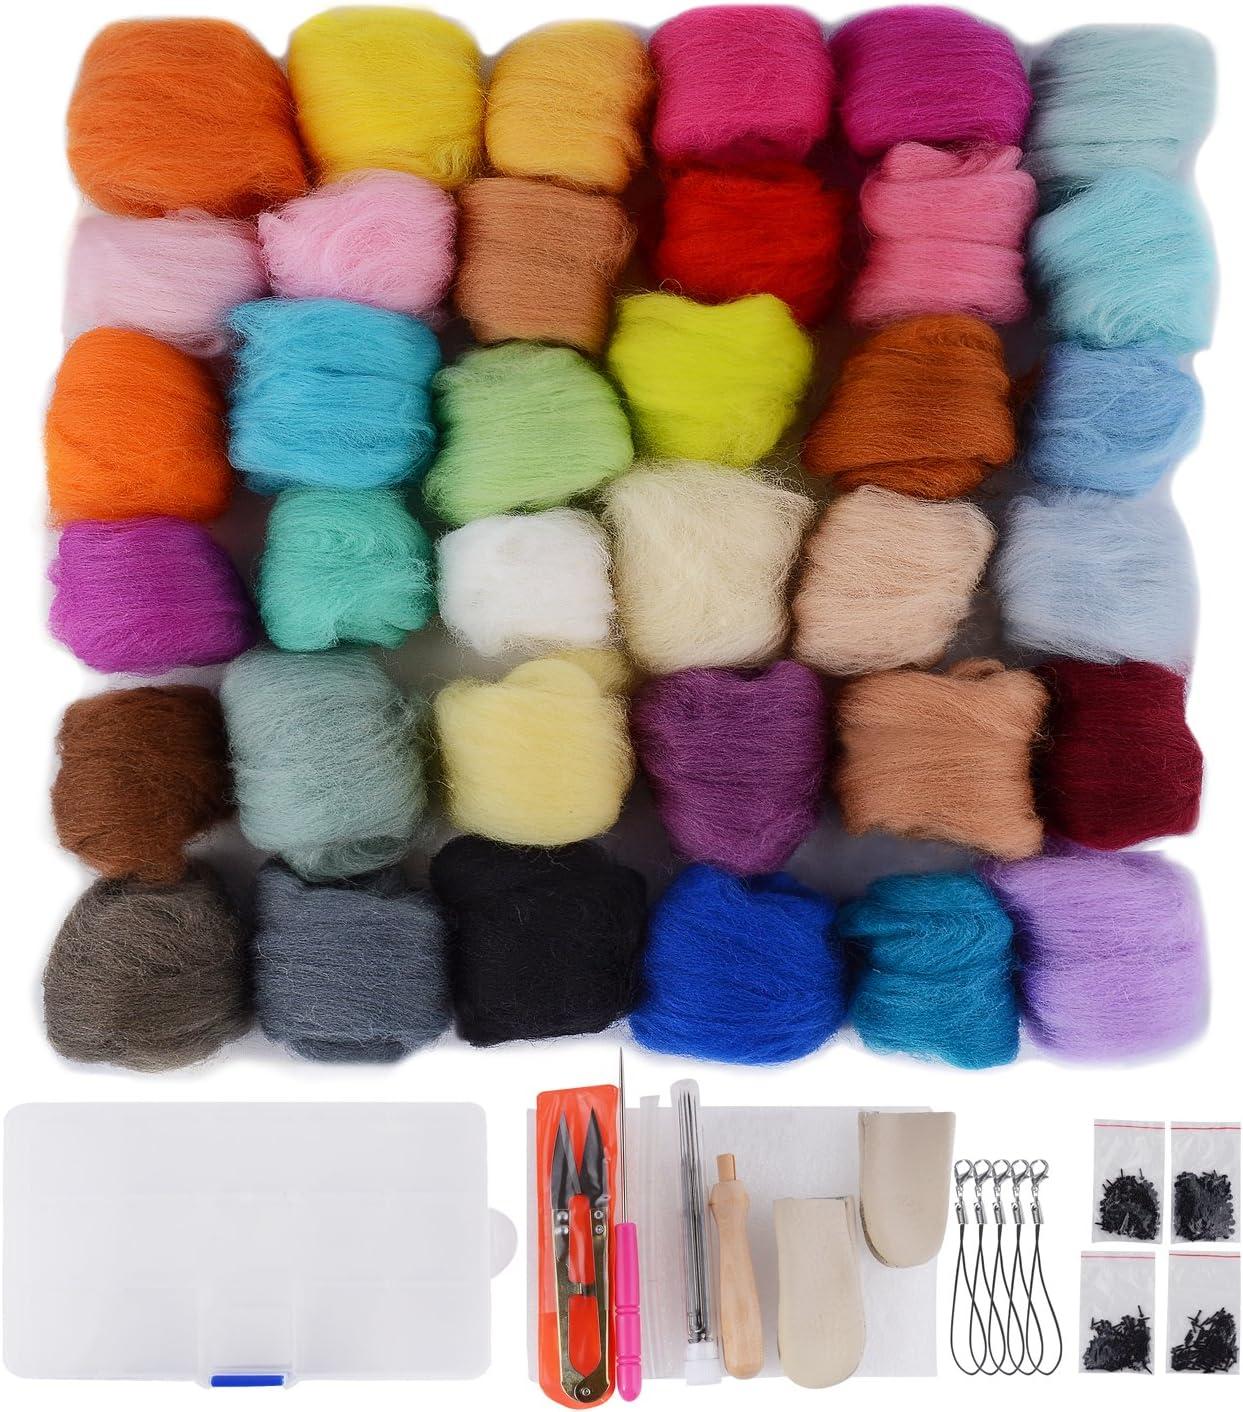 13 PCS Wool Felting Kit Needle Felting Starter Kit Felting Supplies for Needle Felting Needle Felting Kit 3 Colors Wool Roving for Needle Felting 50g//Color